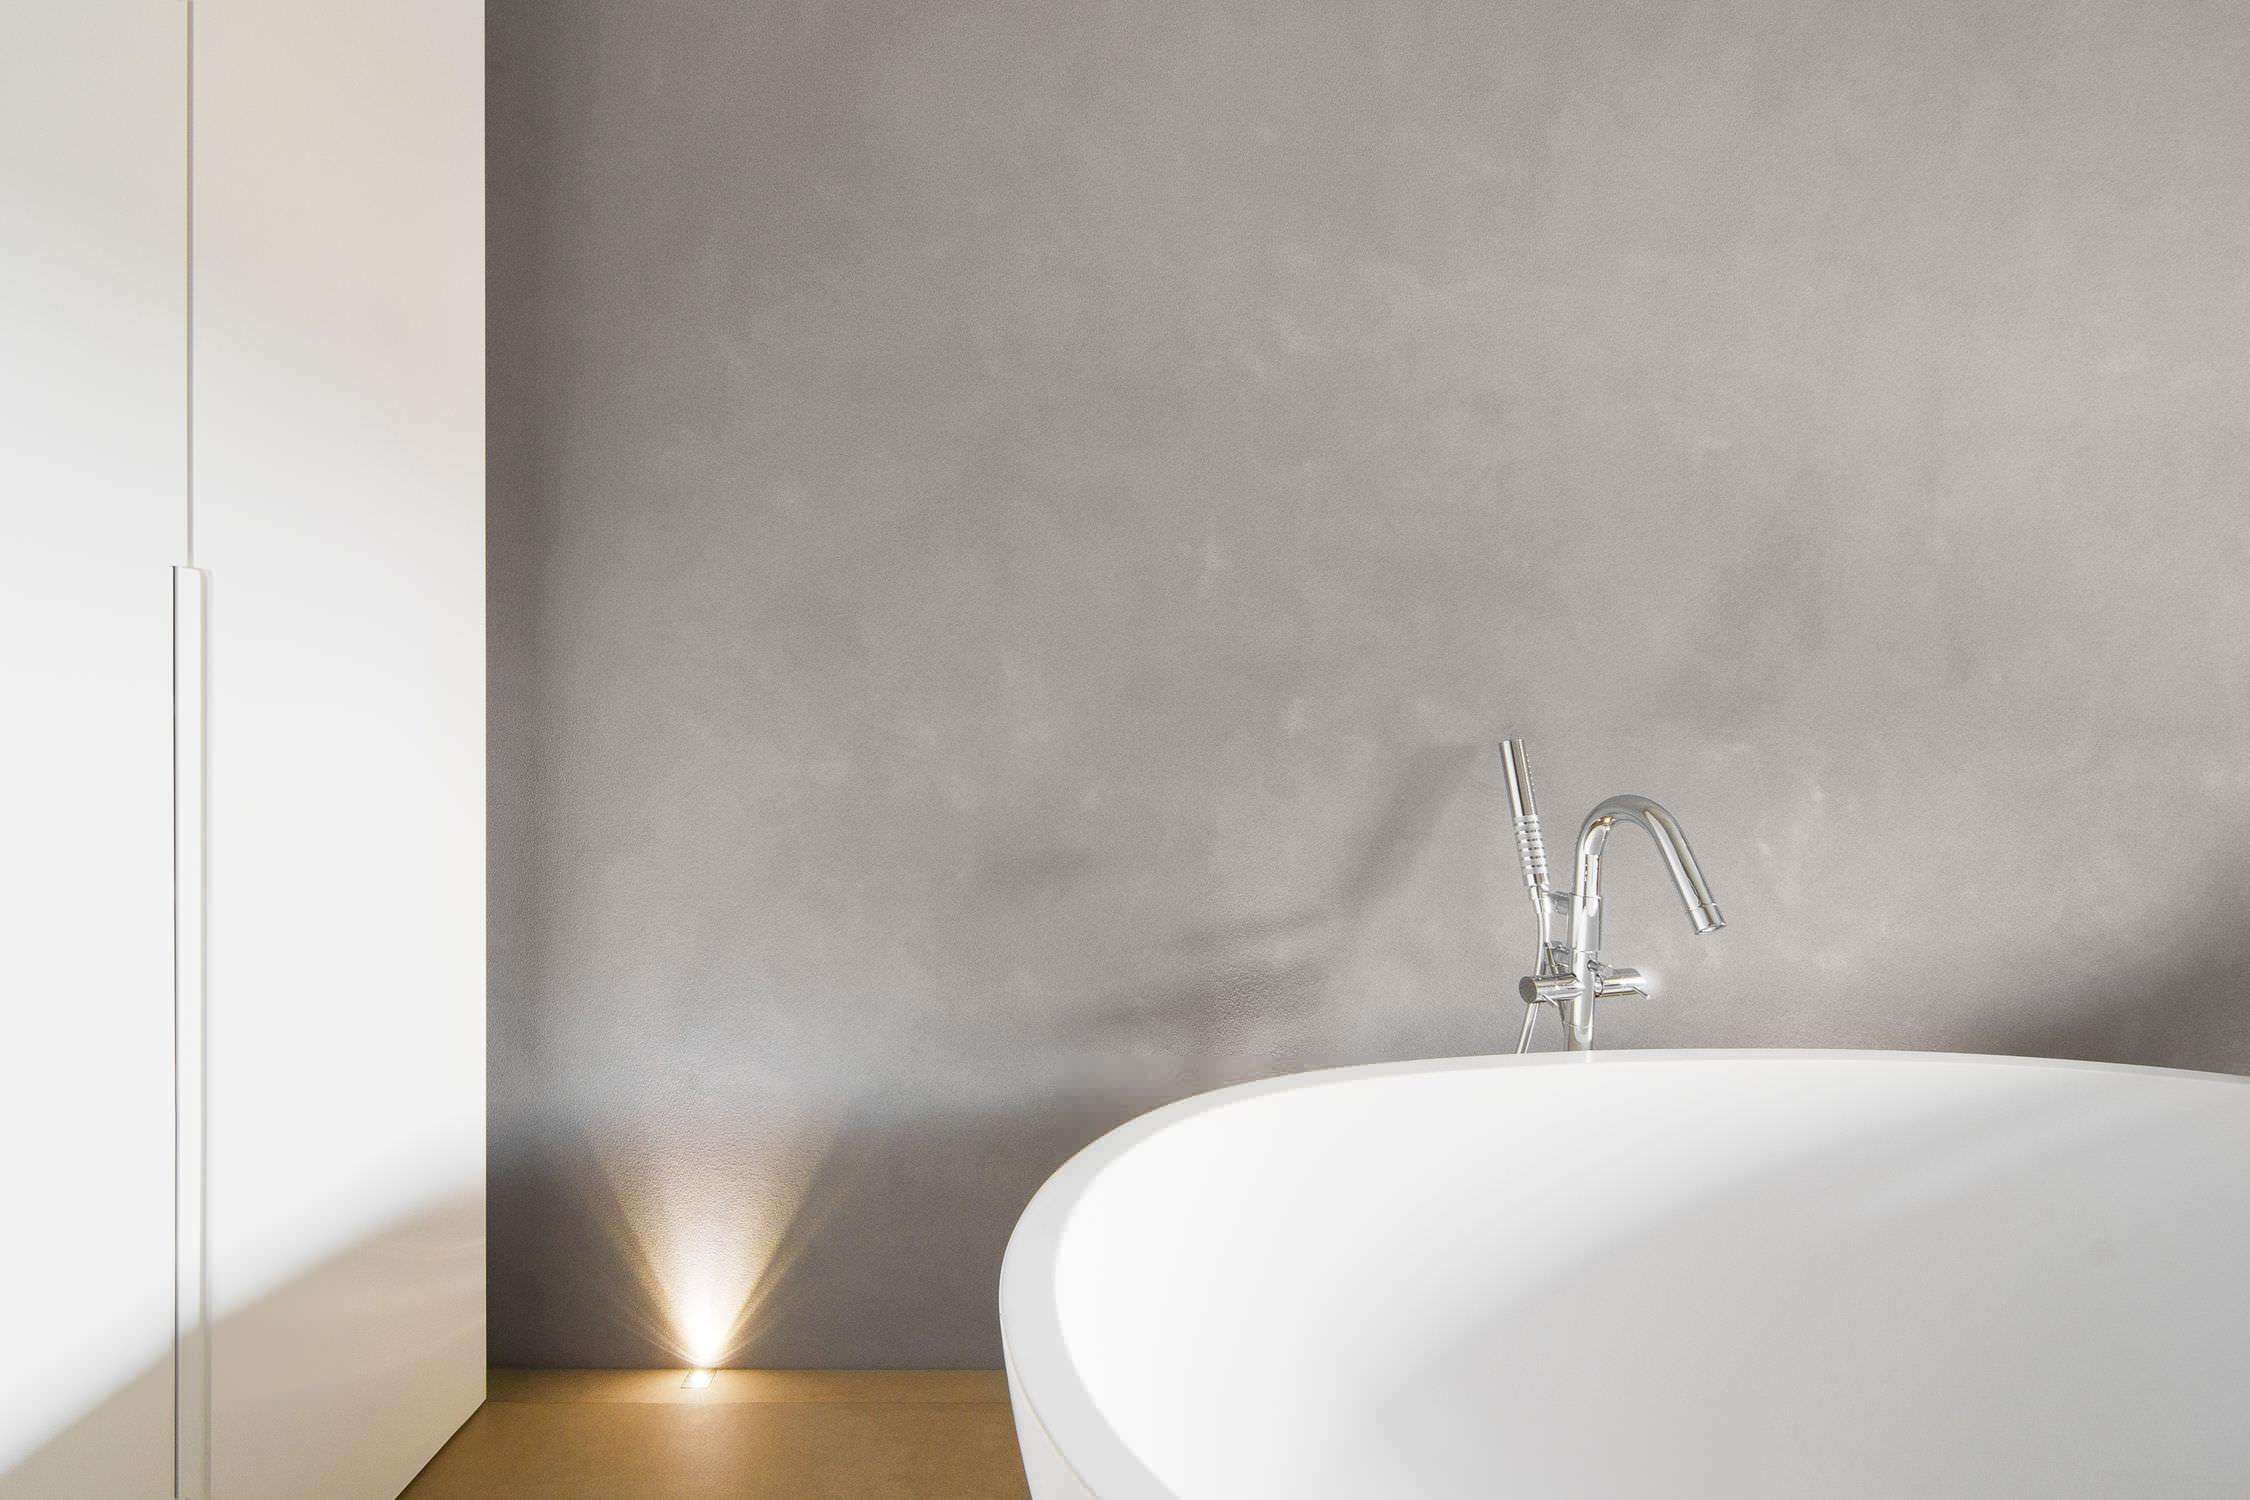 Shower and bathroom beton cire finish contemporary bathroom